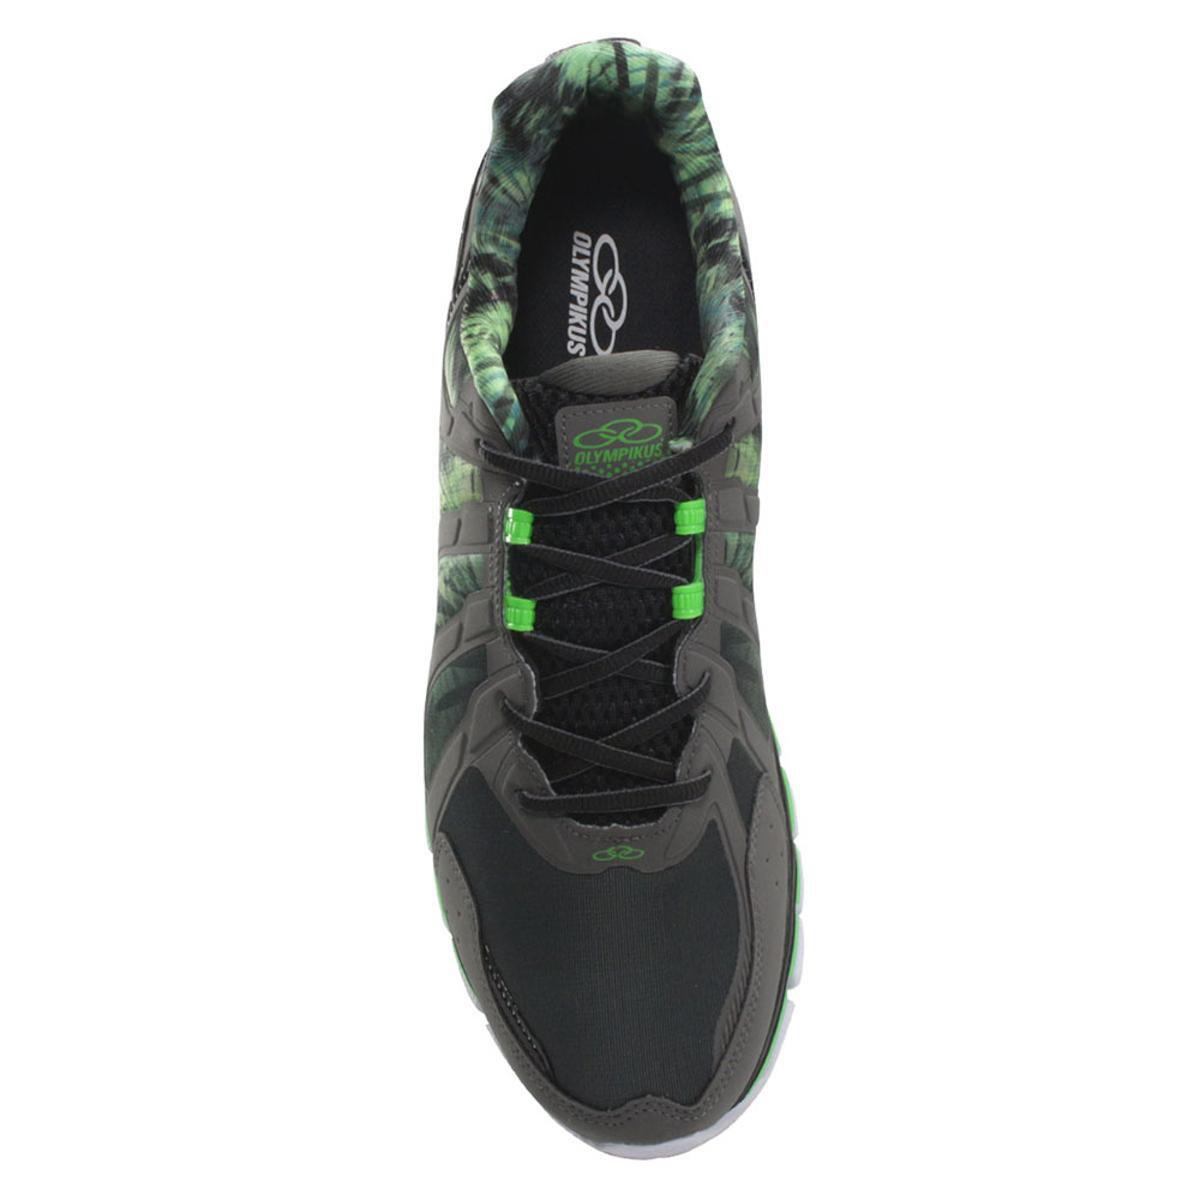 f22bc645346 Tênis olympikus diffuse colors masculino compre agora netshoes diffuse  masculino olympikus time de futebol jpg 1200x1200